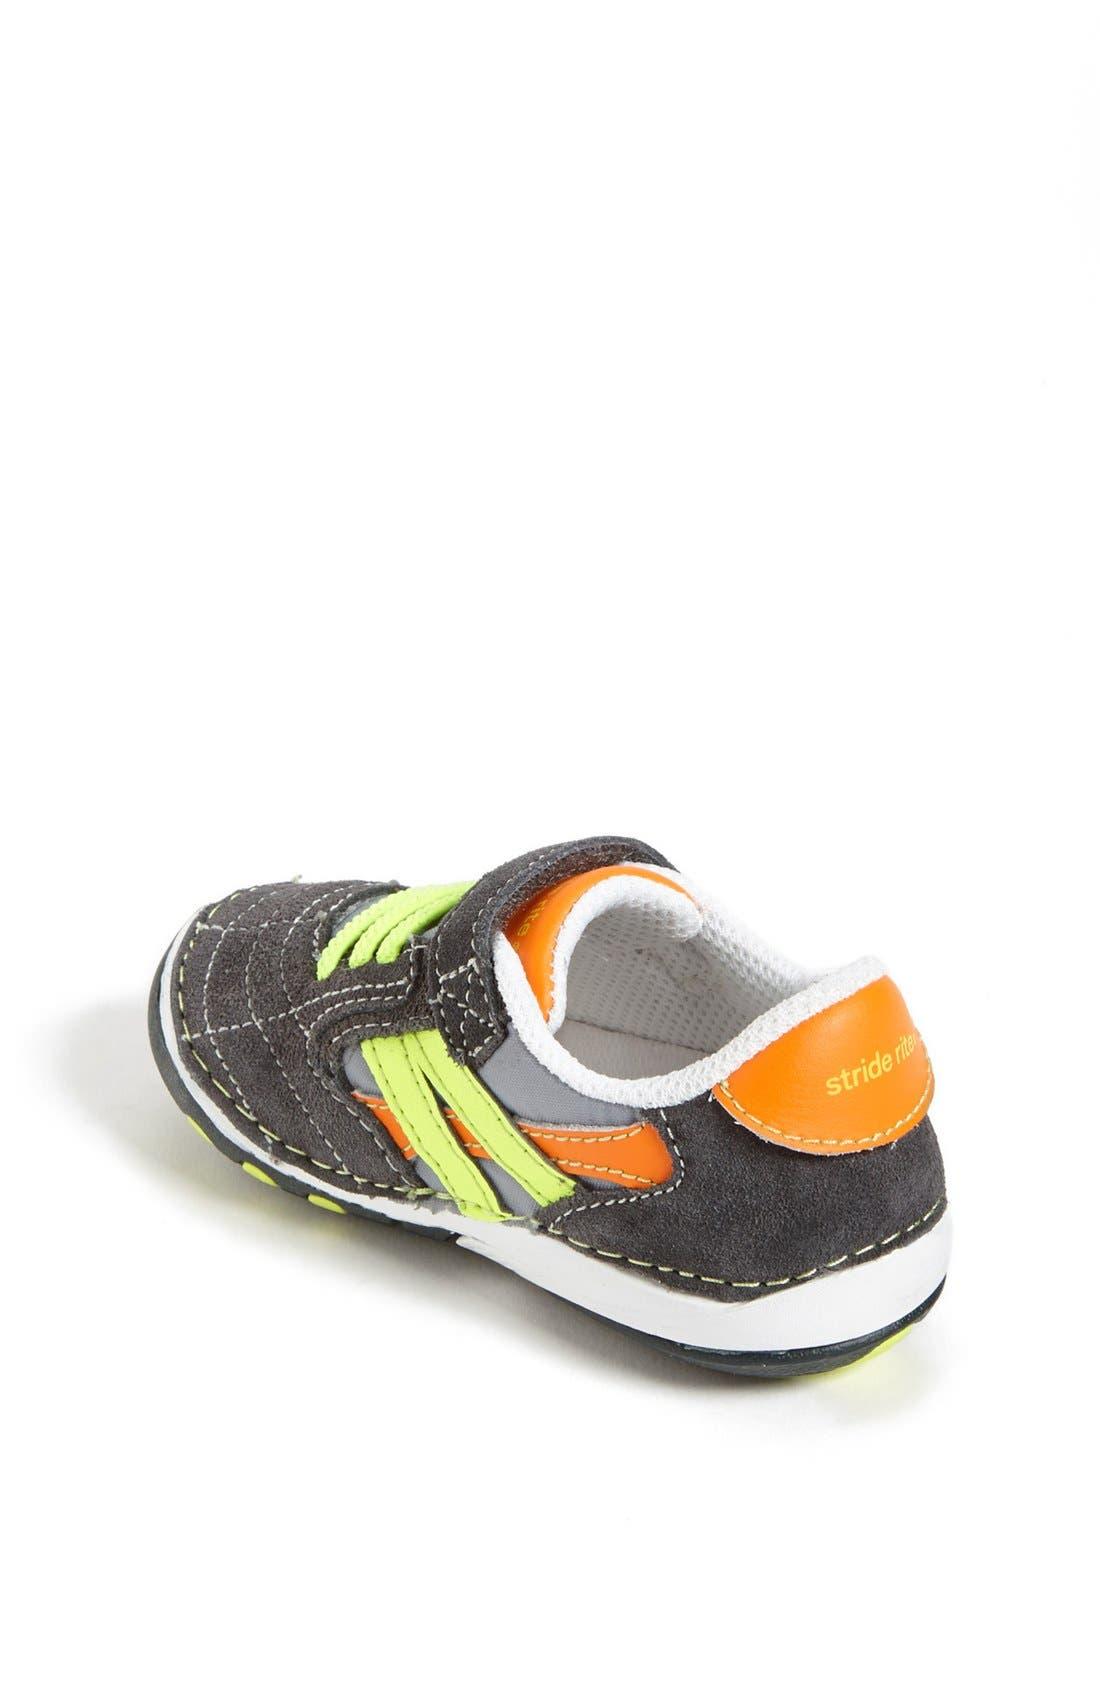 Alternate Image 2  - Stride Rite 'Jason' Sneaker (Baby & Walker)